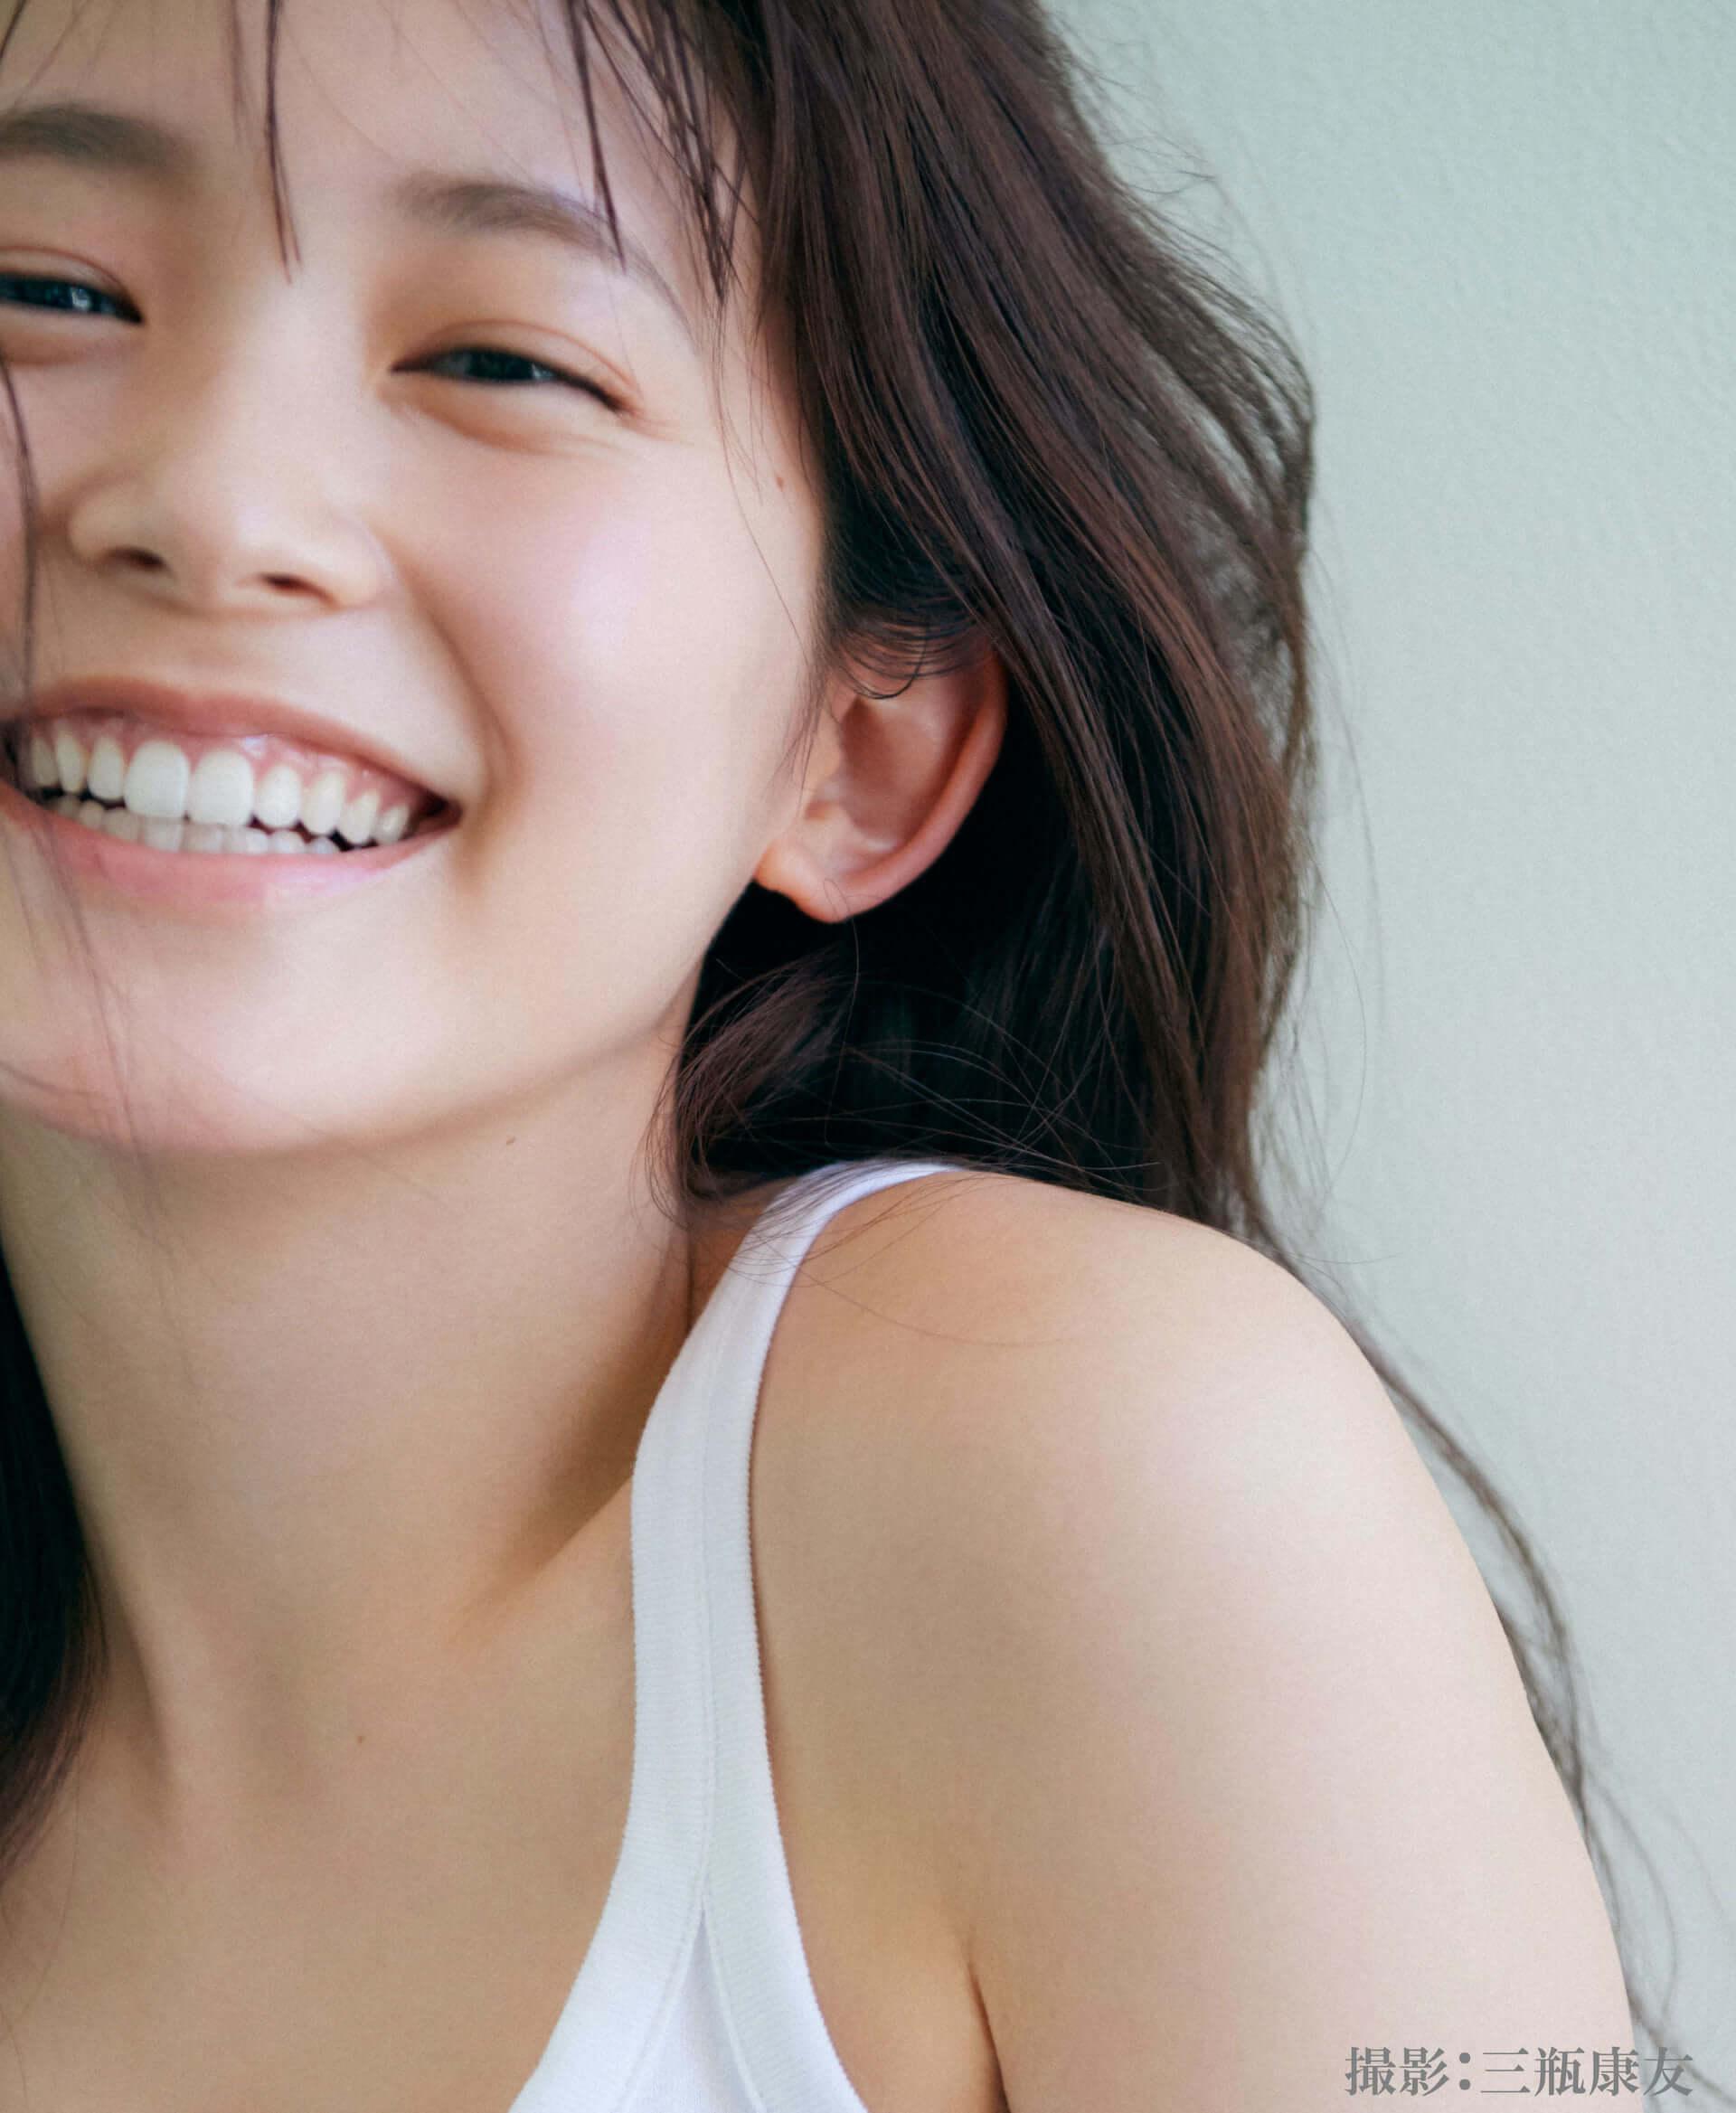 Seventeen専属モデル・久間田琳加の10代ラストに初の写真集&スタイルブックが同時発売決定! life200401_rinka_kumada_2-1920x2337